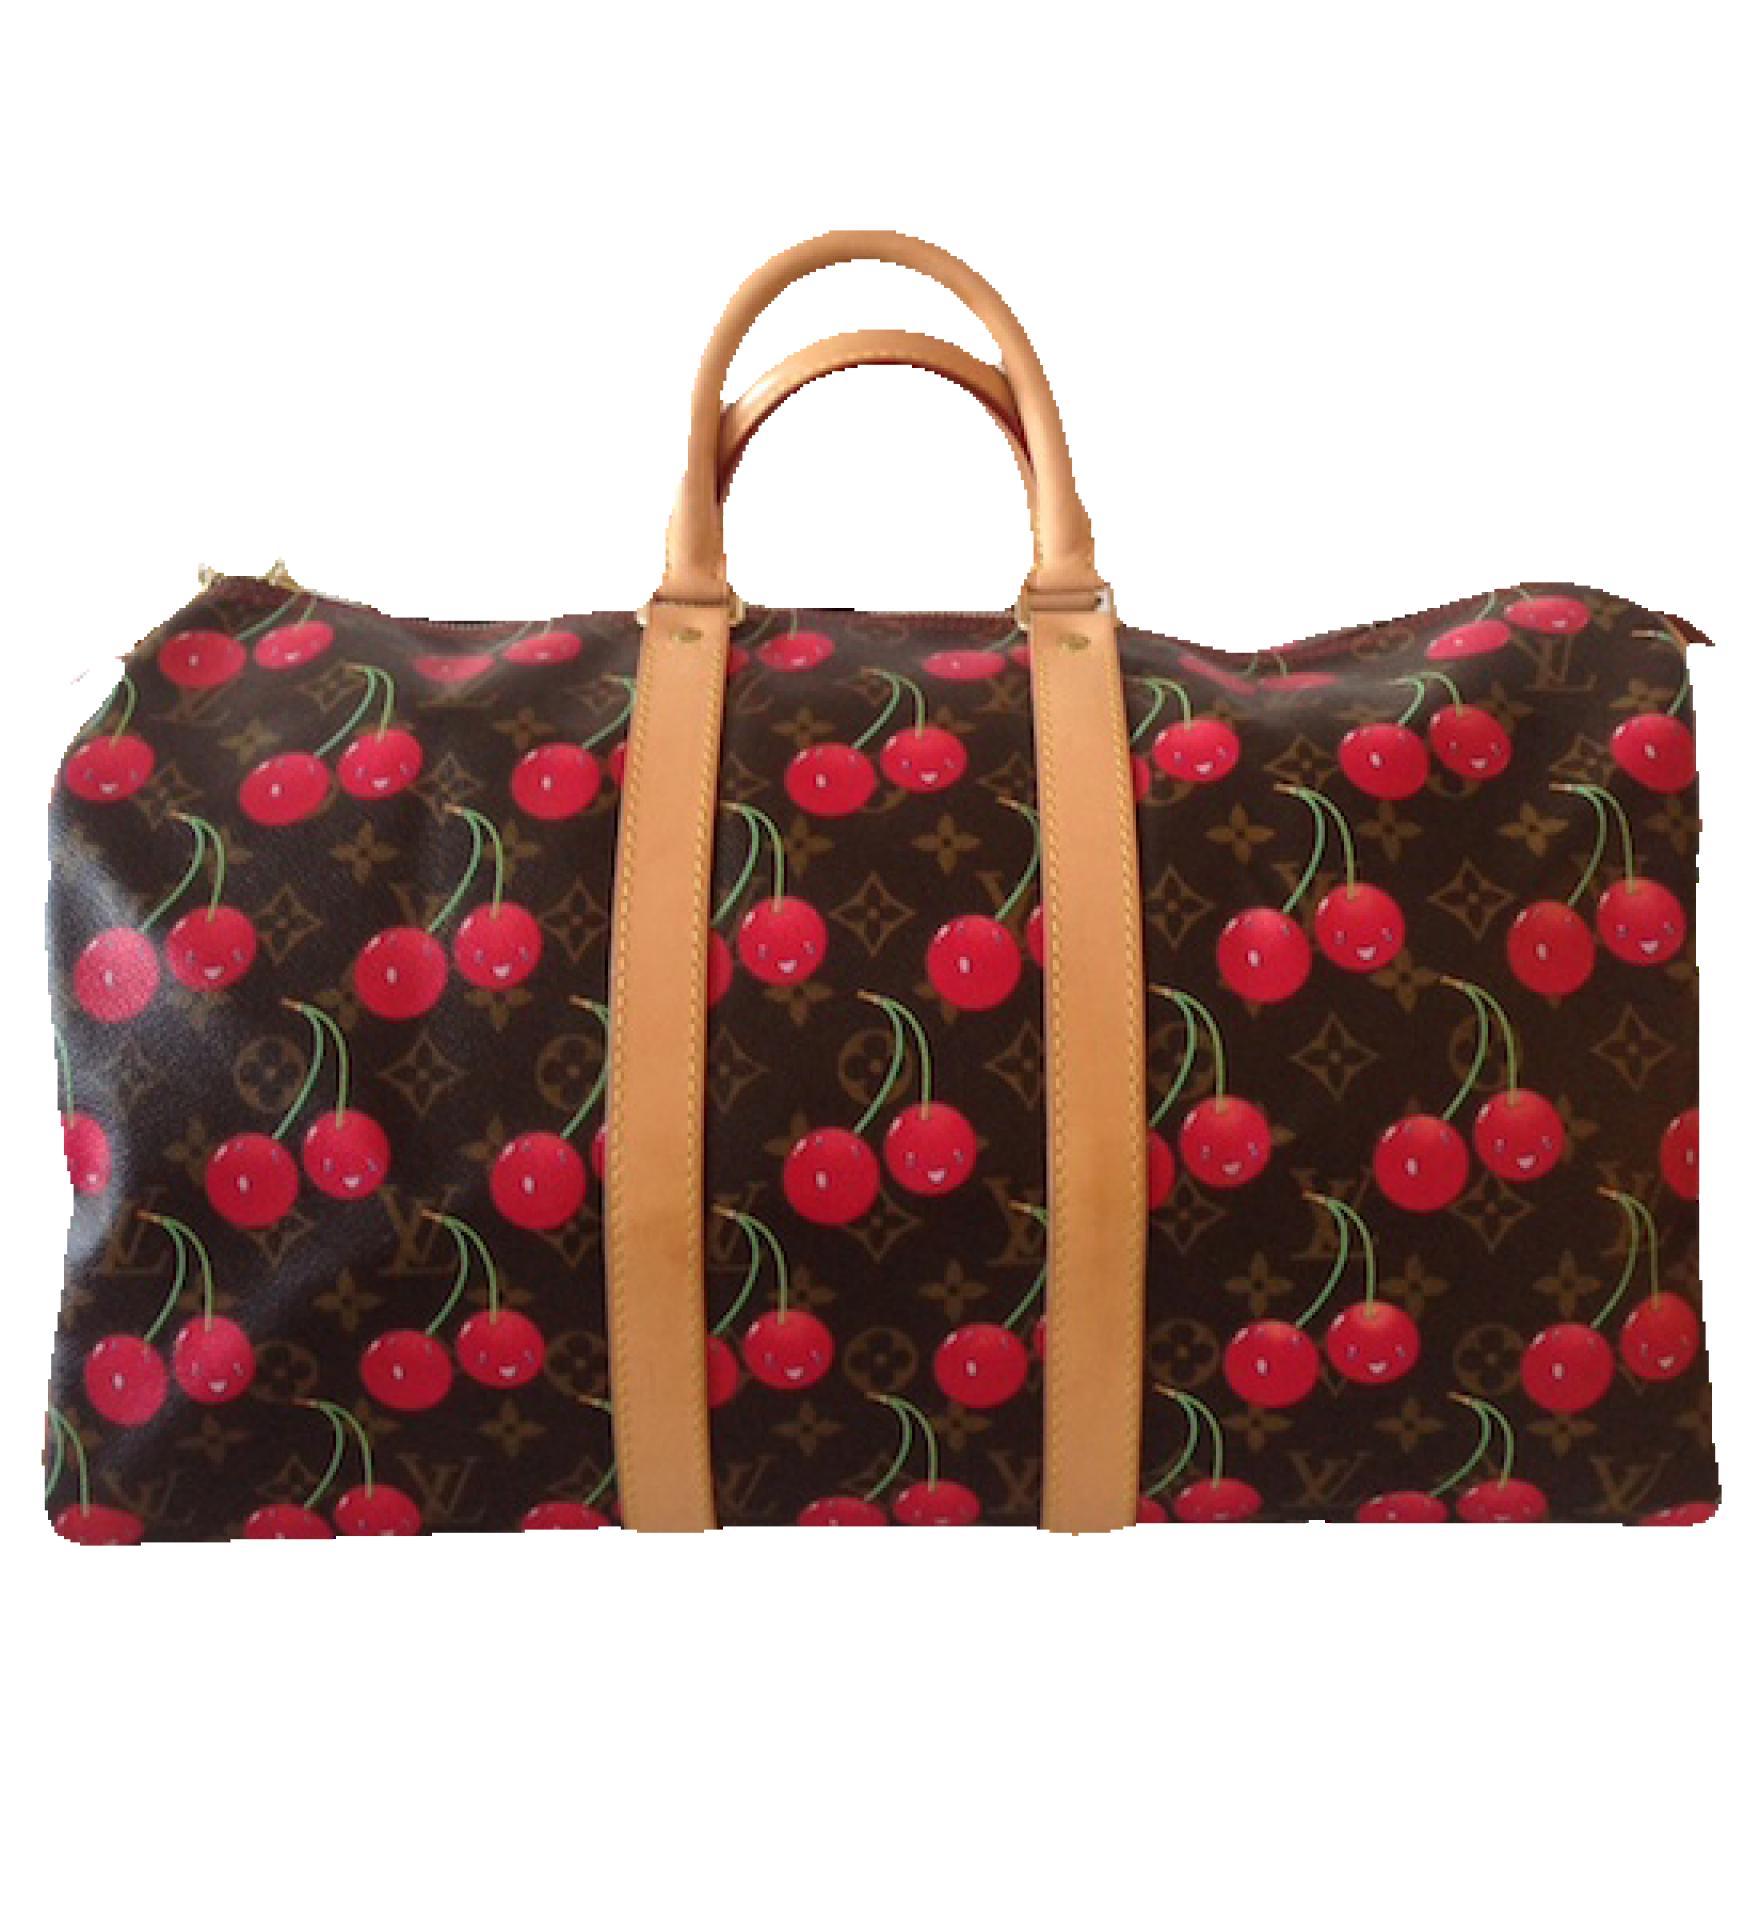 Louis Vuitton Louis Vuitton Keepall Collection Cherries Bag by Takashi Murakami